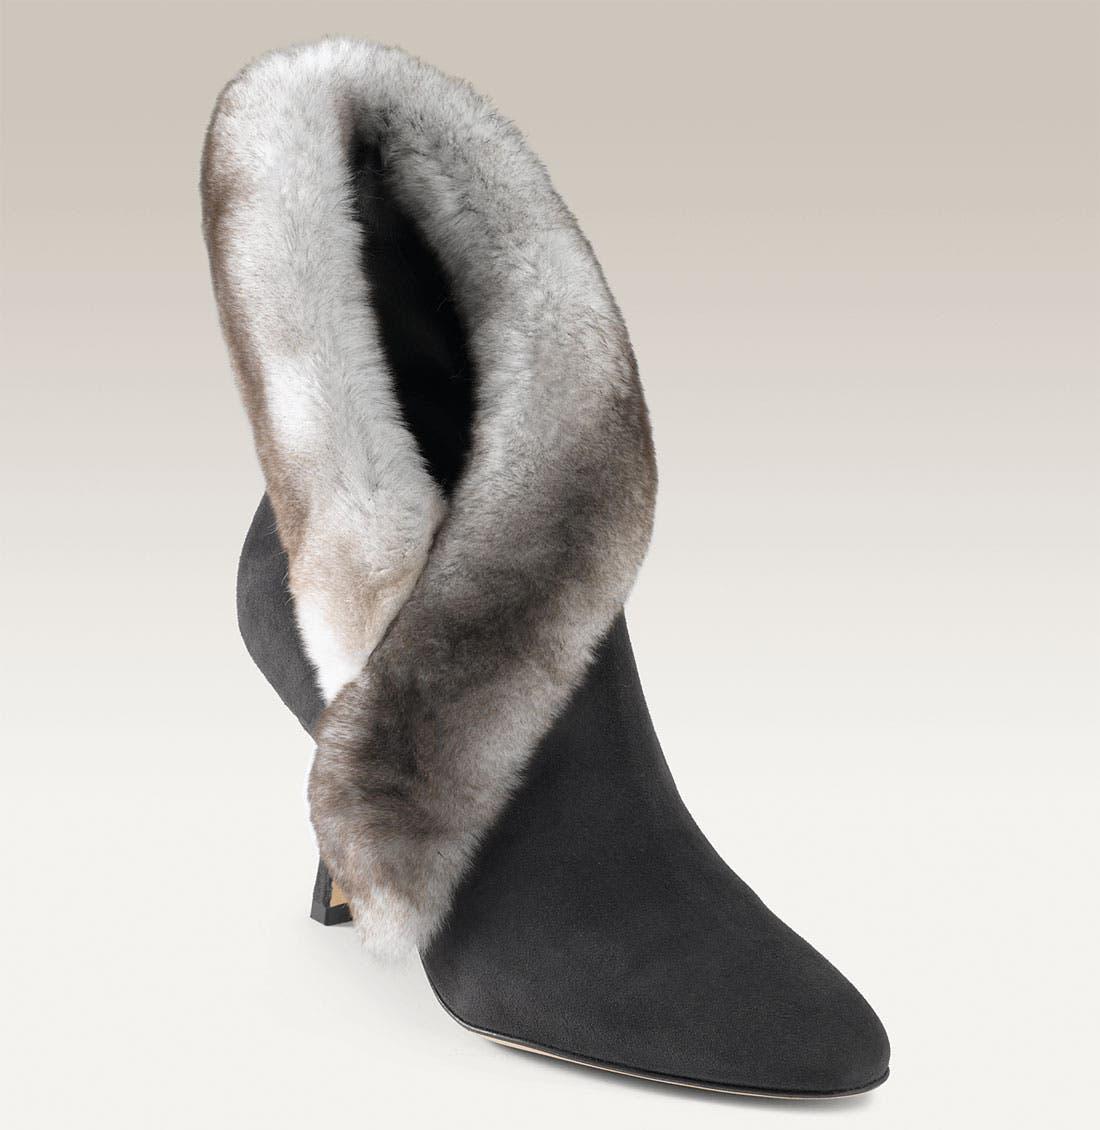 Alternate Image 1 Selected - Manolo Blahnik 'Nesta' Fur Trim Bootie